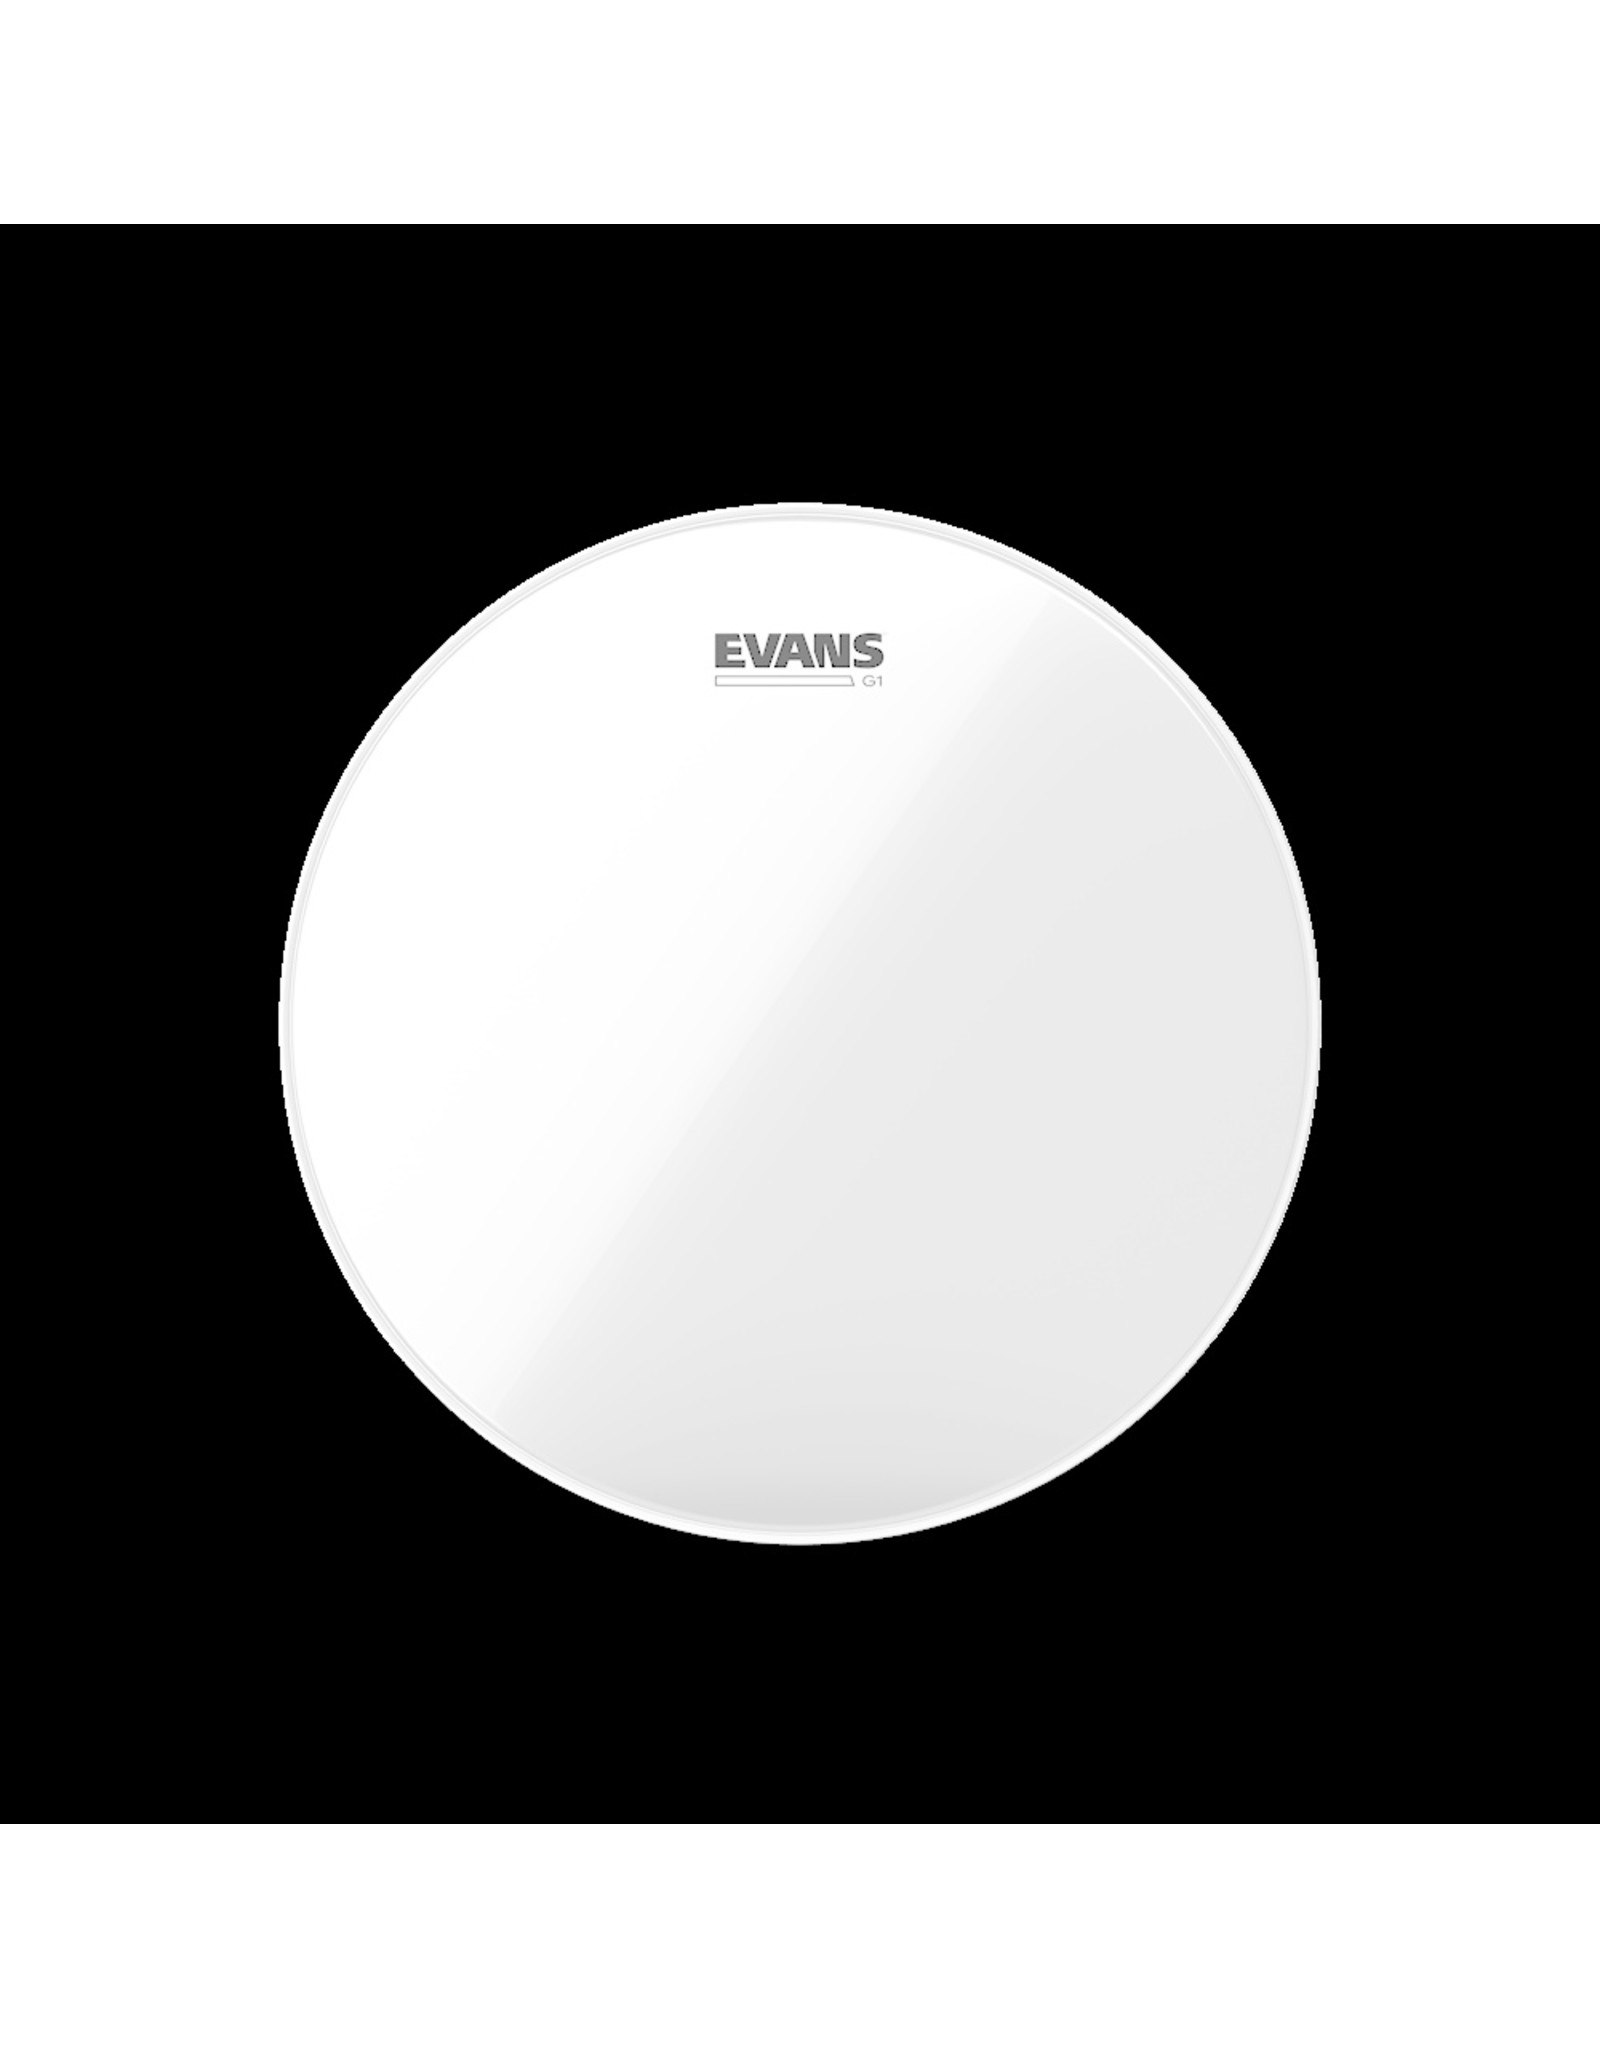 "Evans 12"" G1 Clear Drum Head"